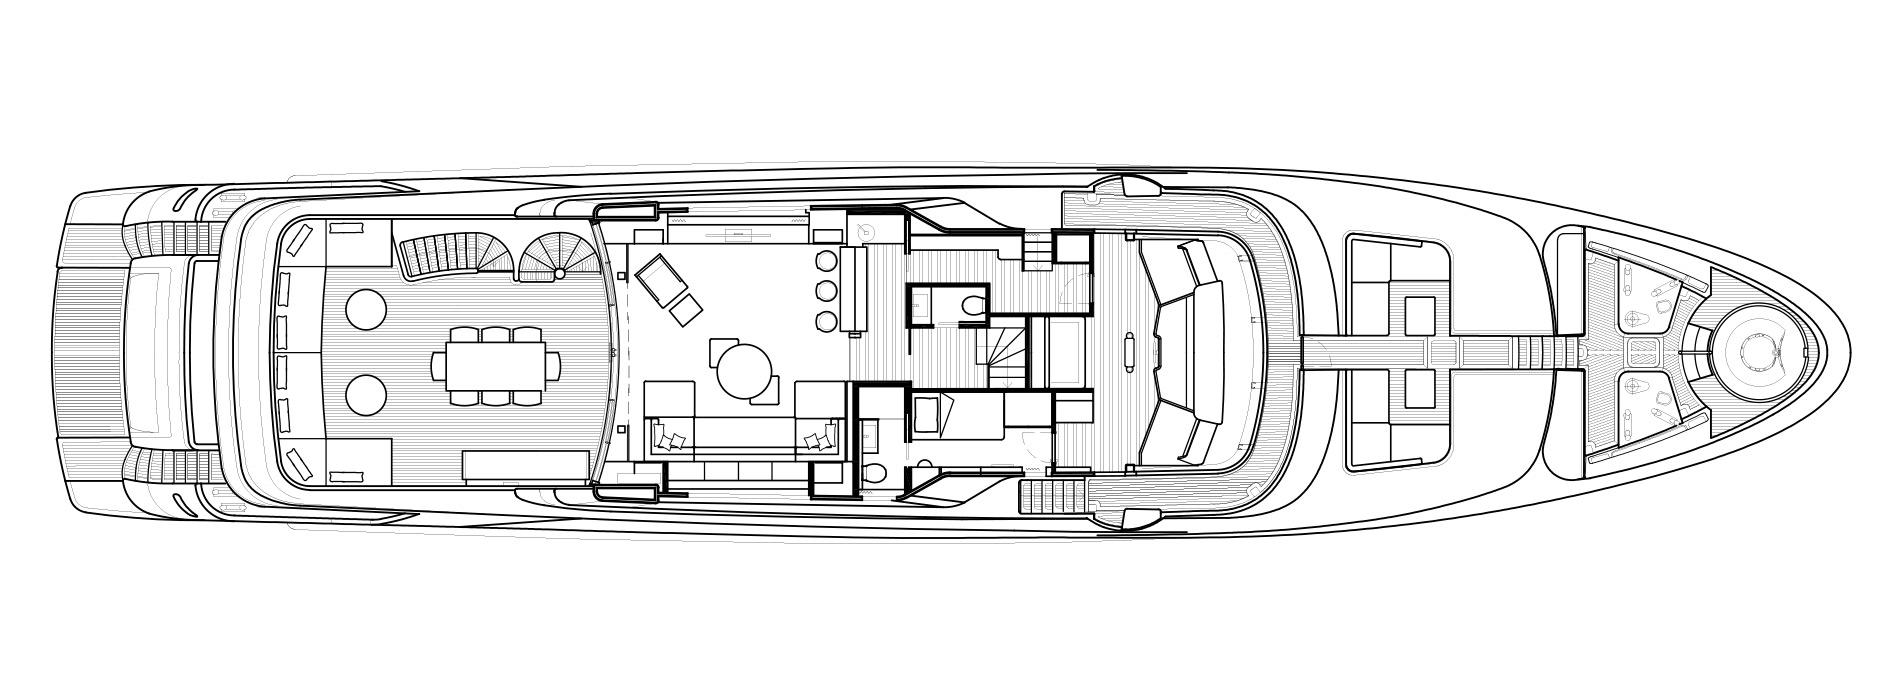 Sanlorenzo Yachts SD126 верхний палуба версия B